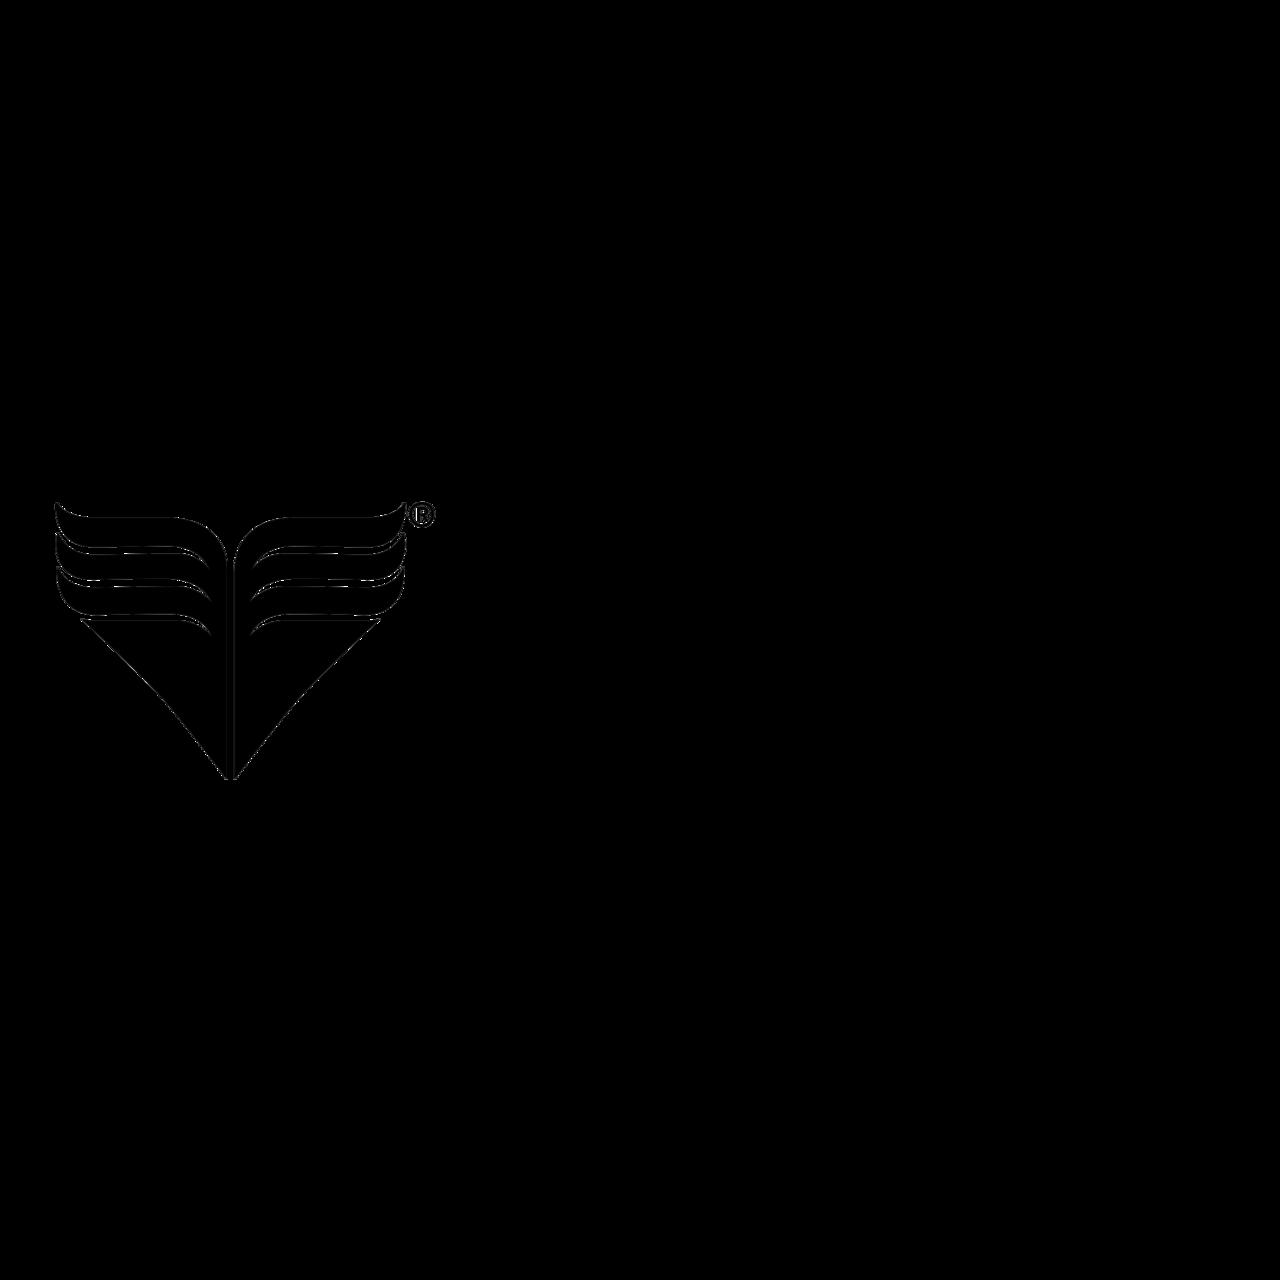 tyr-logo-black-and-white-1